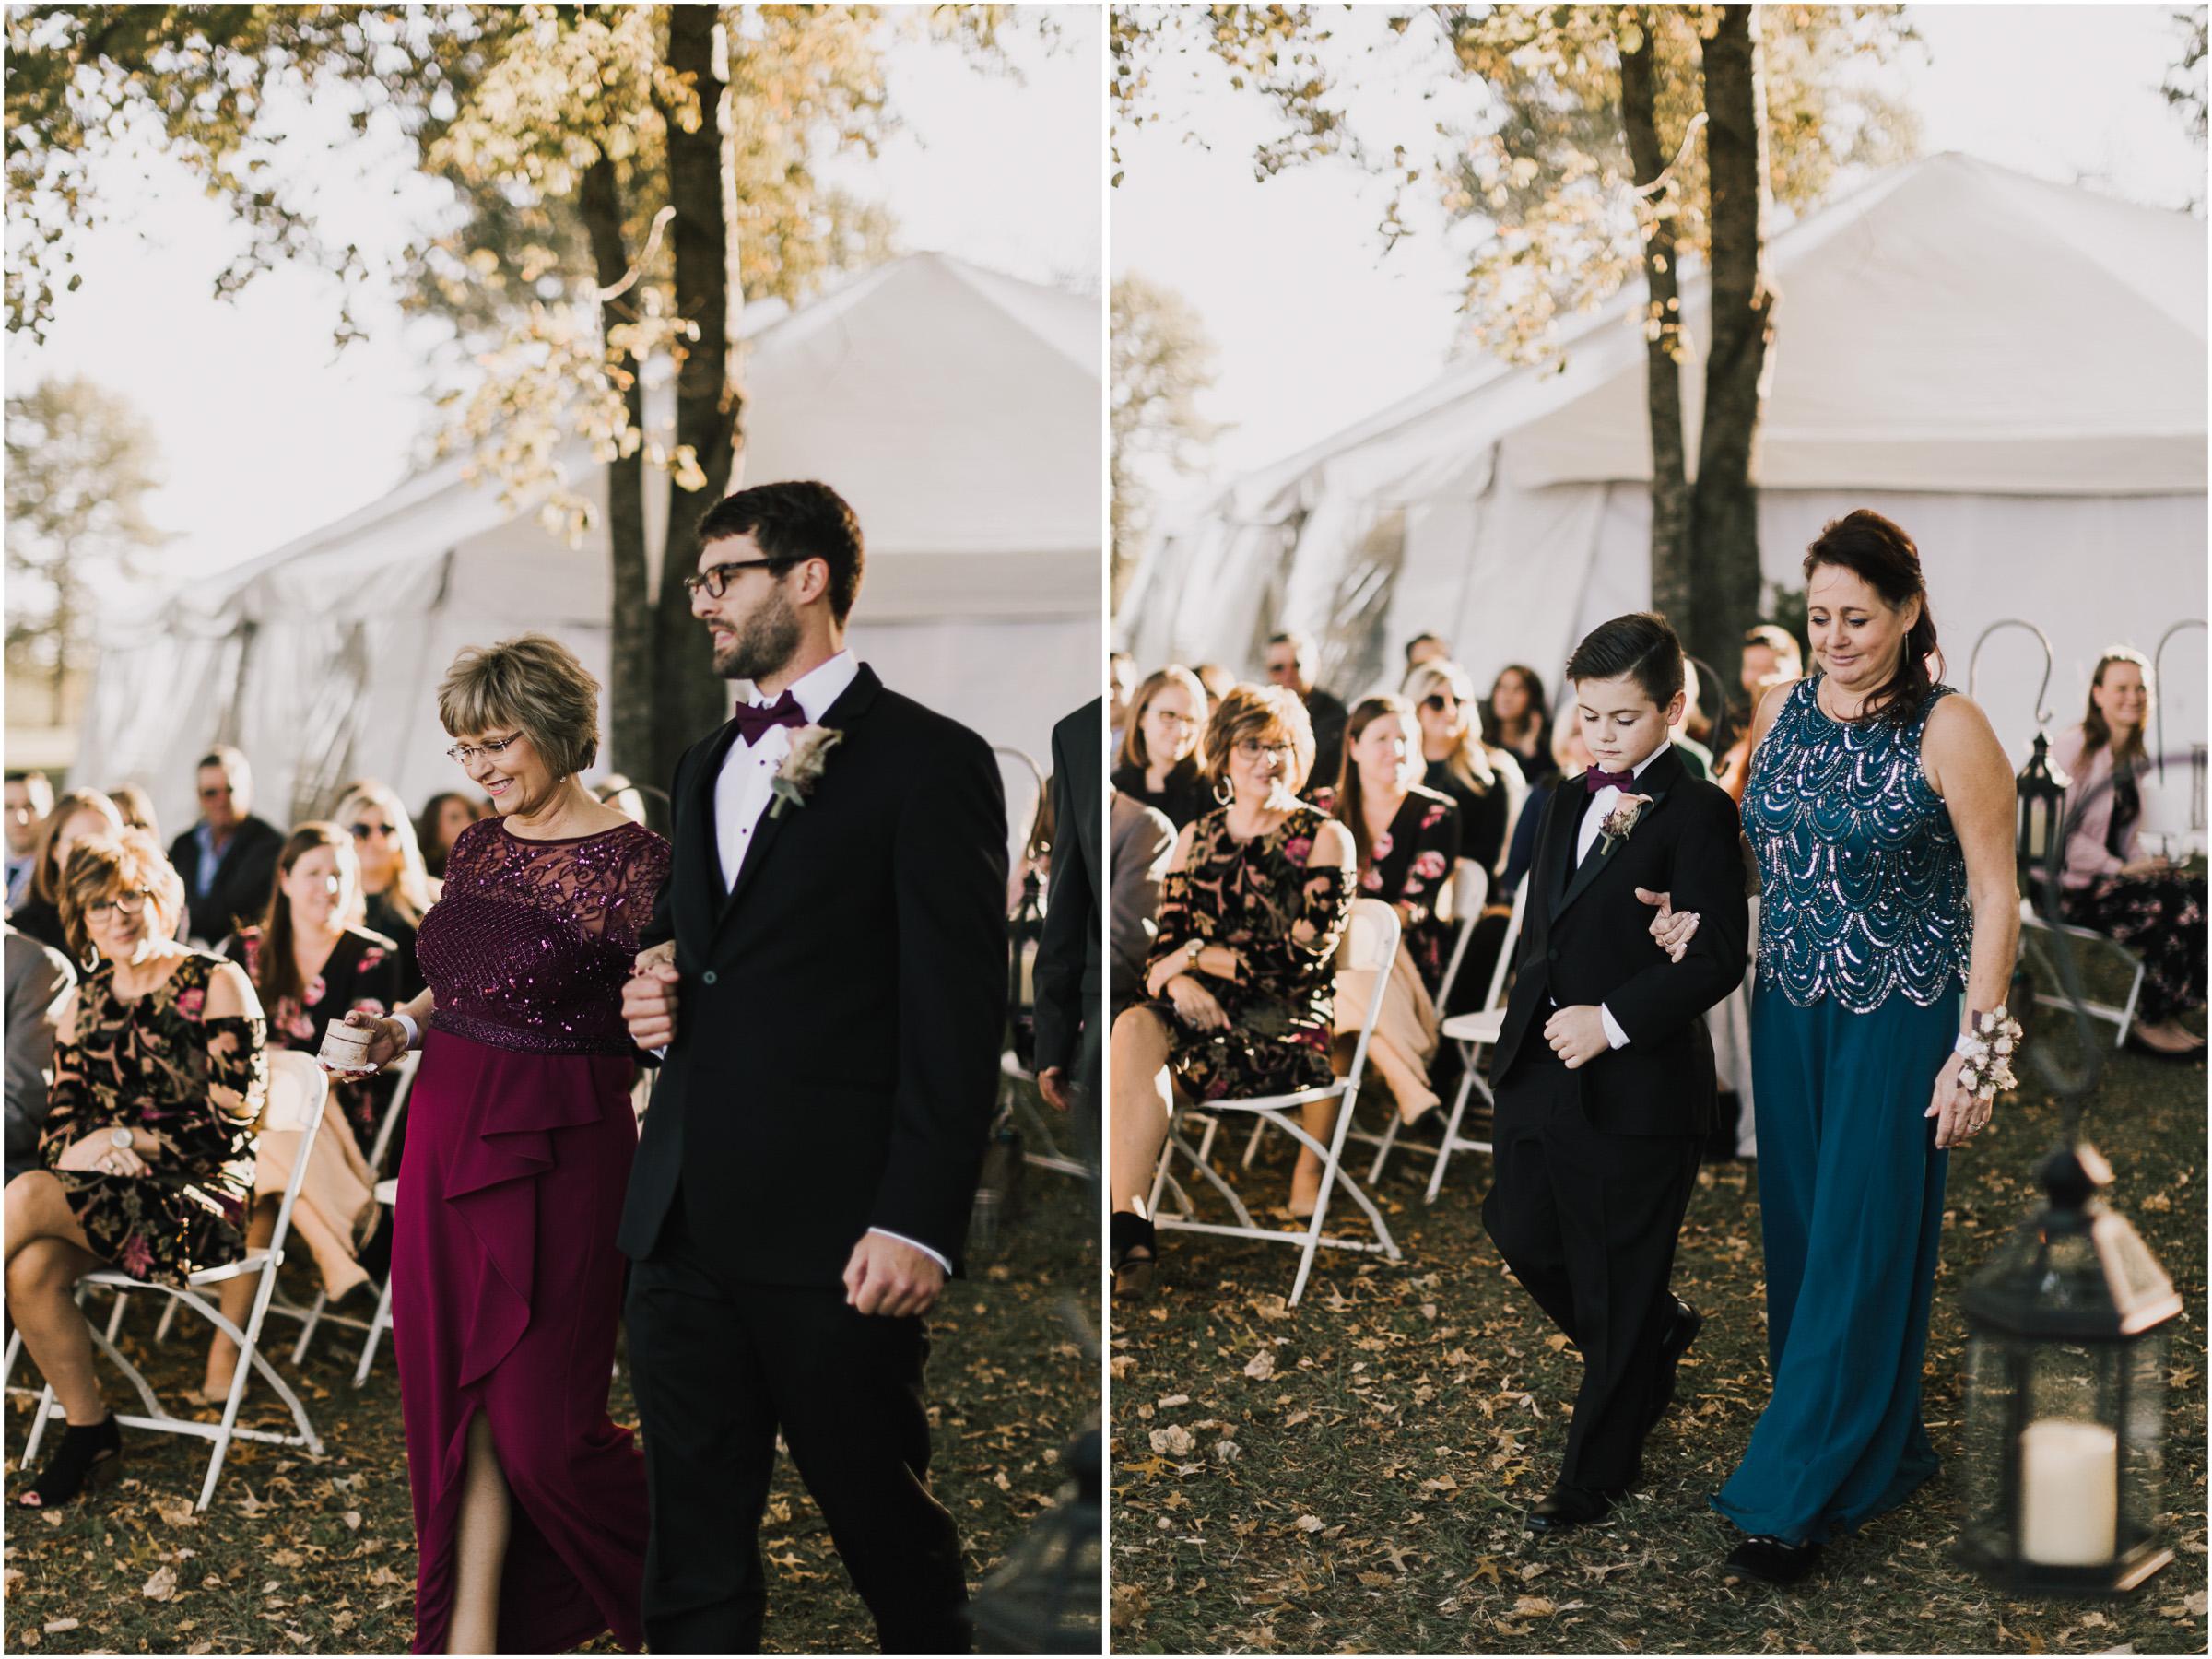 alyssa barletter photography intimate fall autumn wedding rural missouri wedding photographer-26.jpg